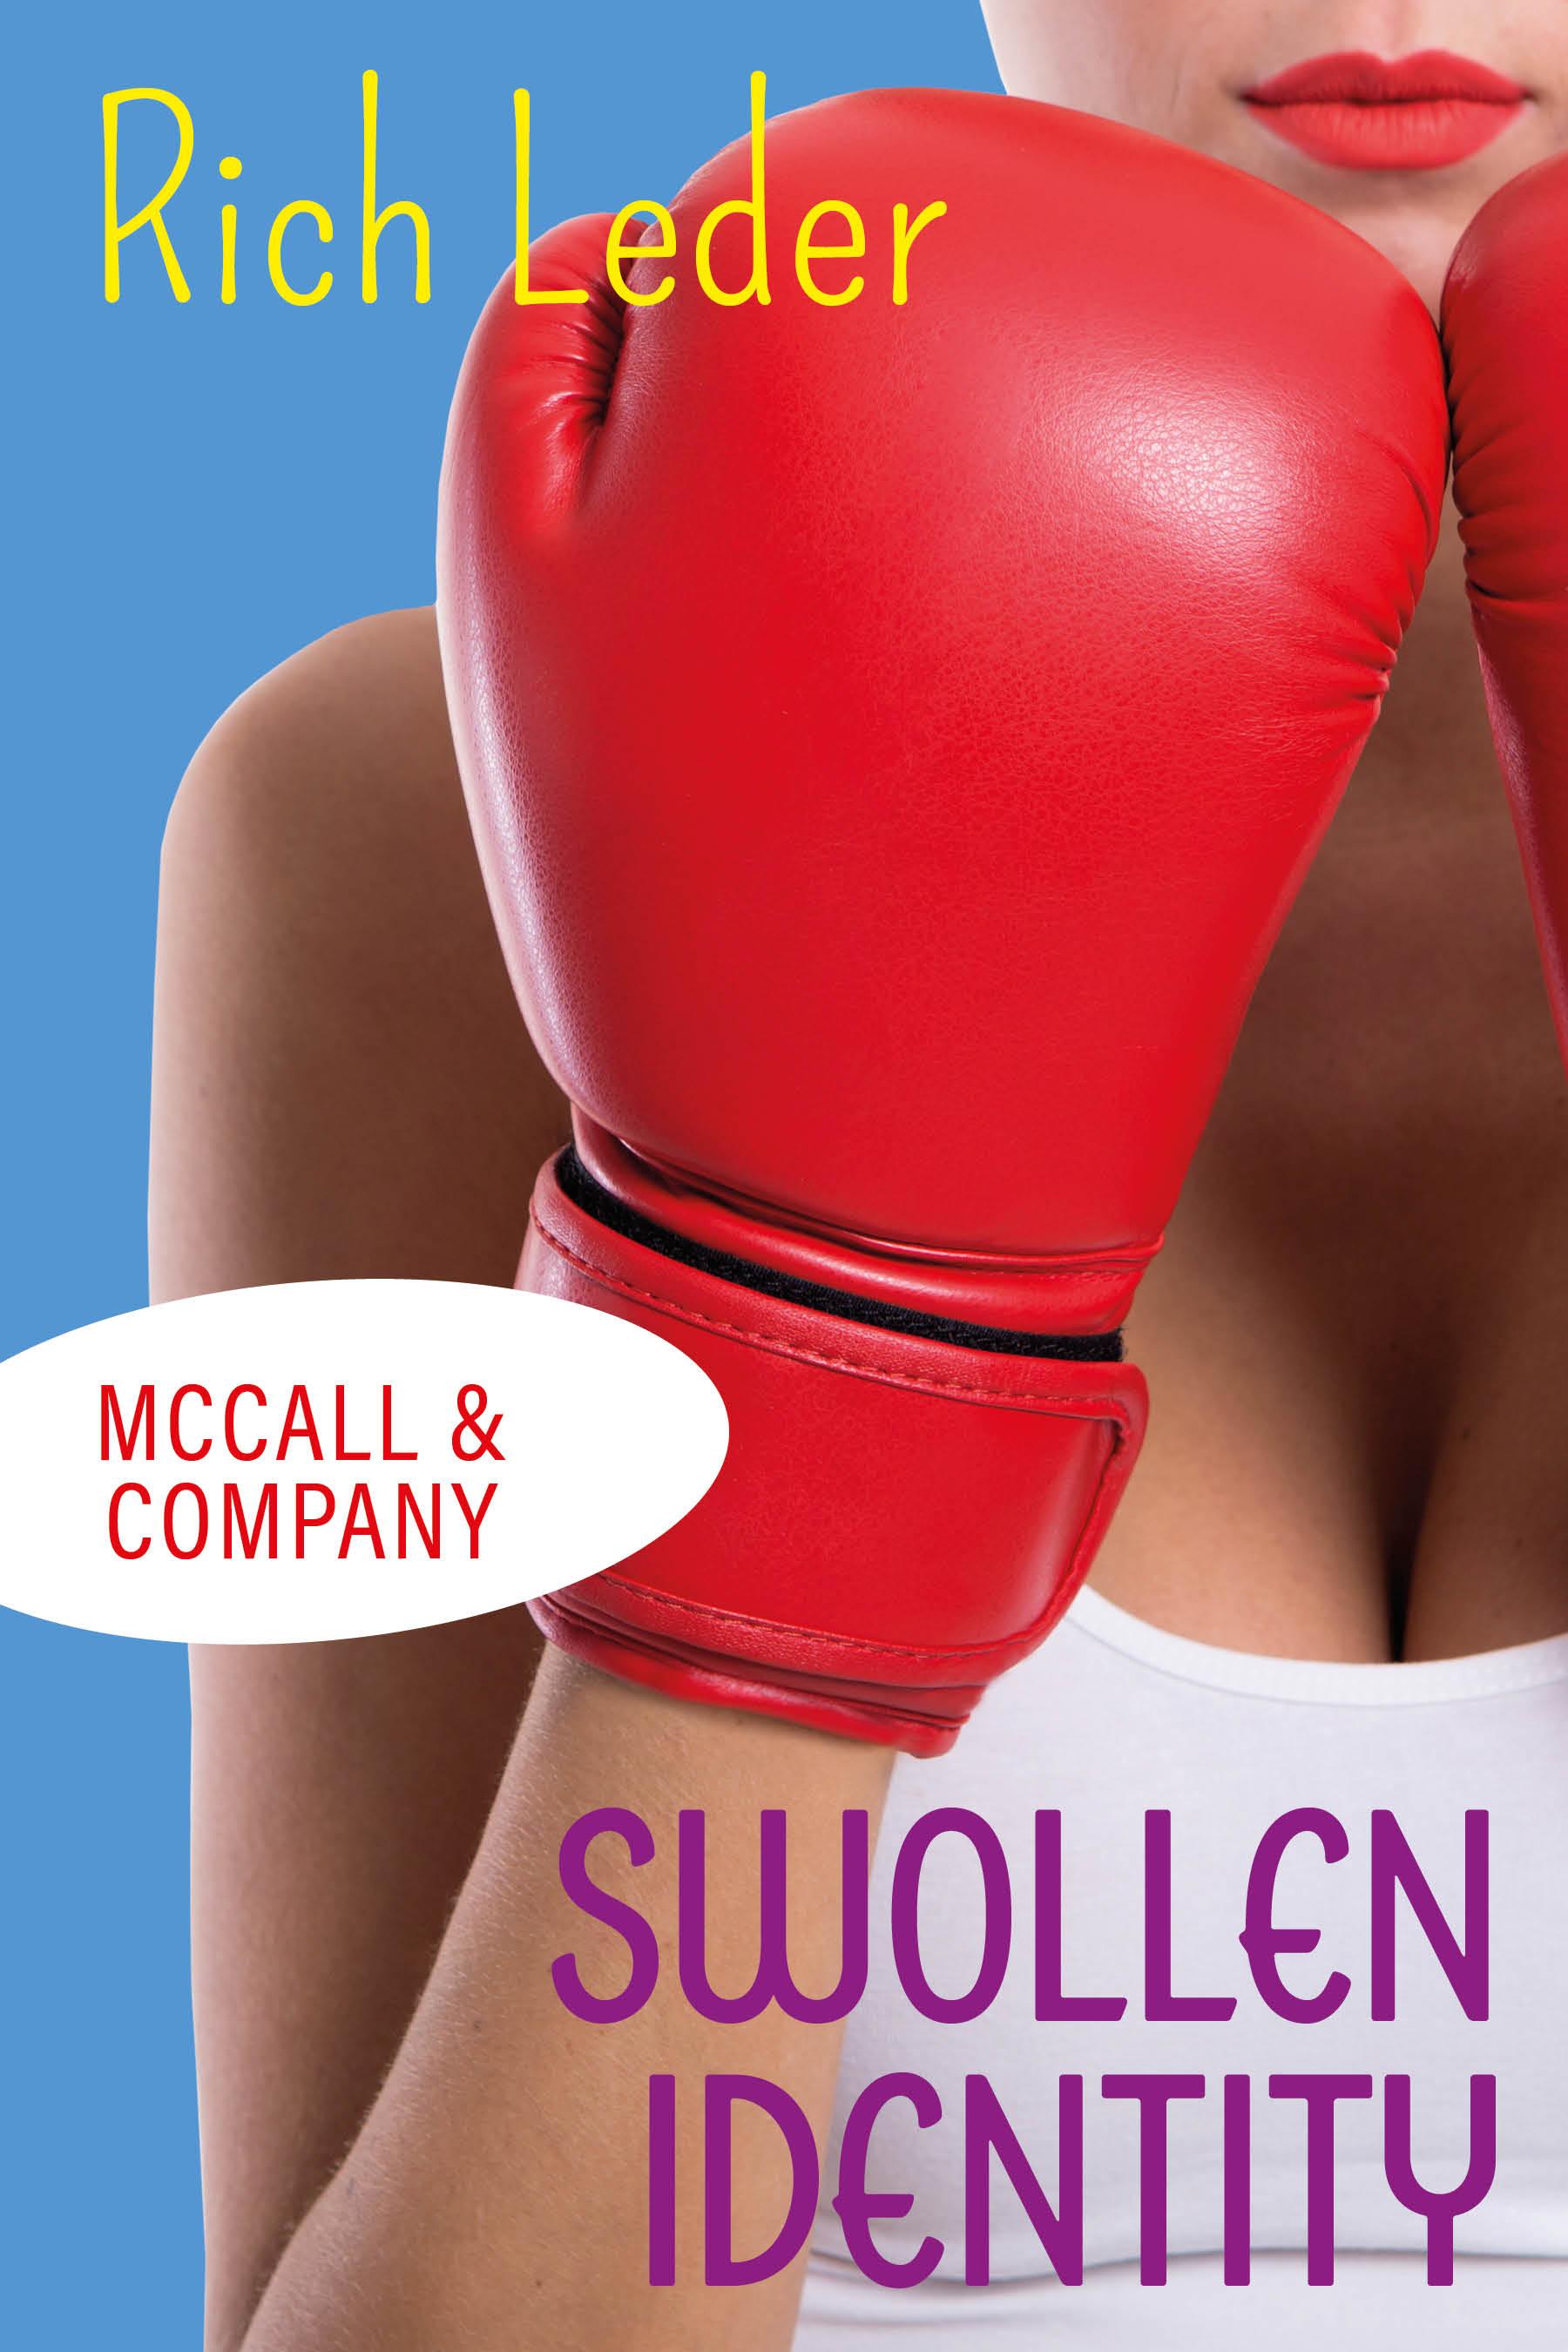 SWOLLEN FINAL COVER LARGE EBOOK.jpg